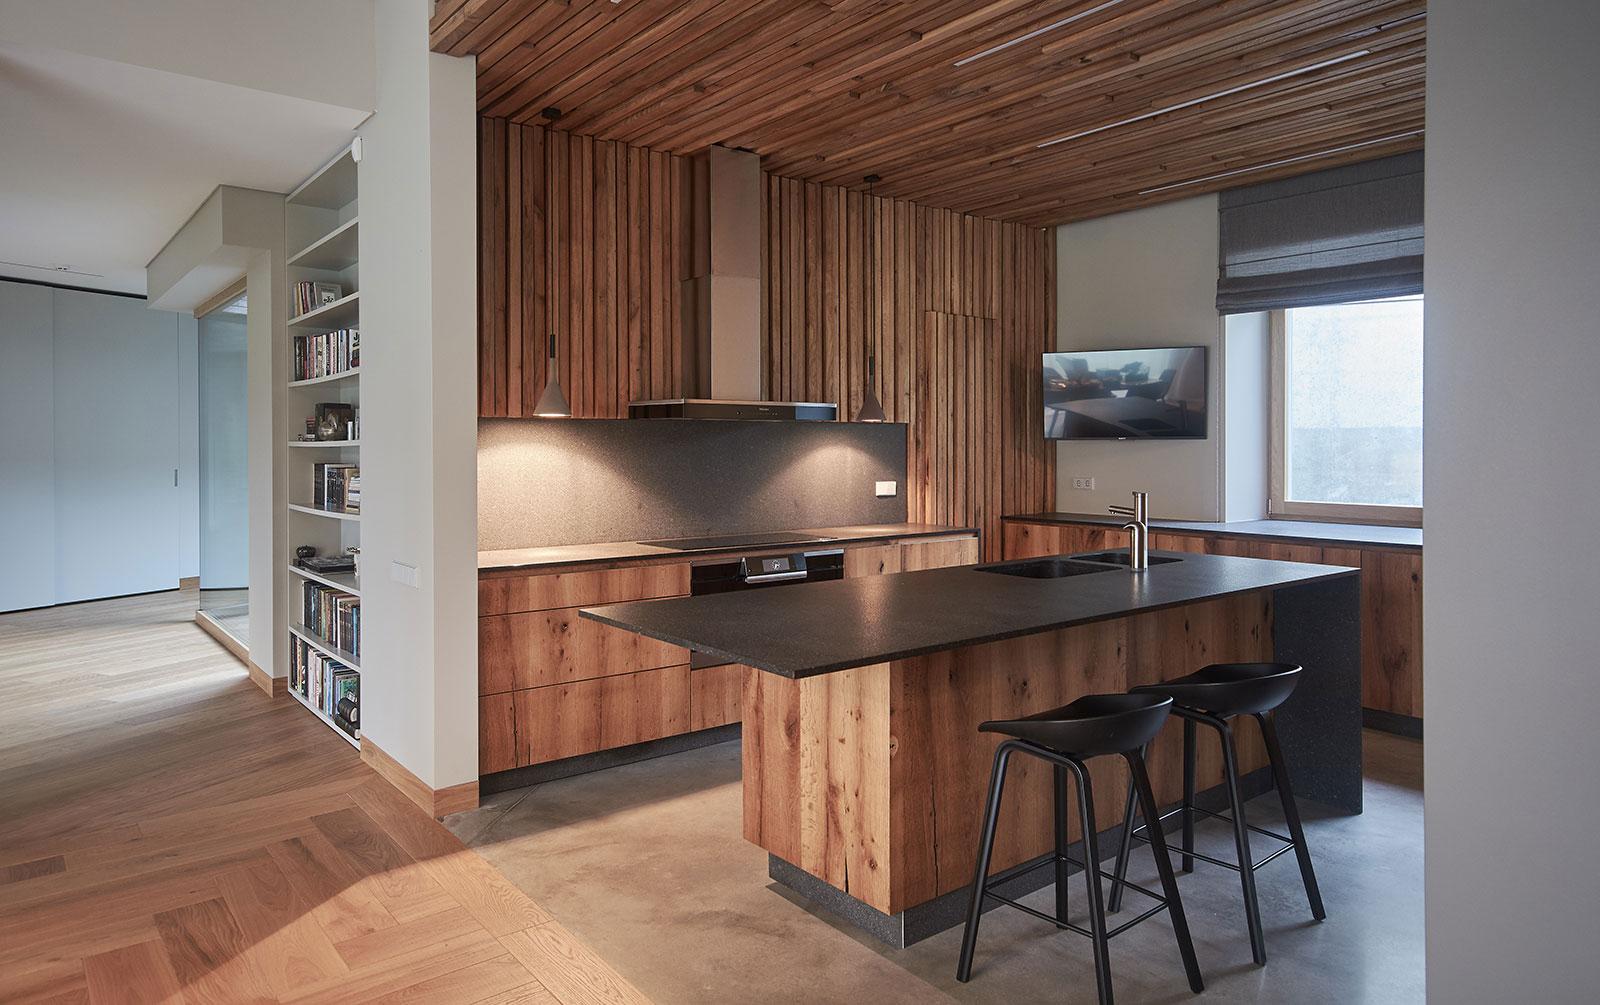 Modern Interior House Inspired by Natural Surrounding | nebrau.com